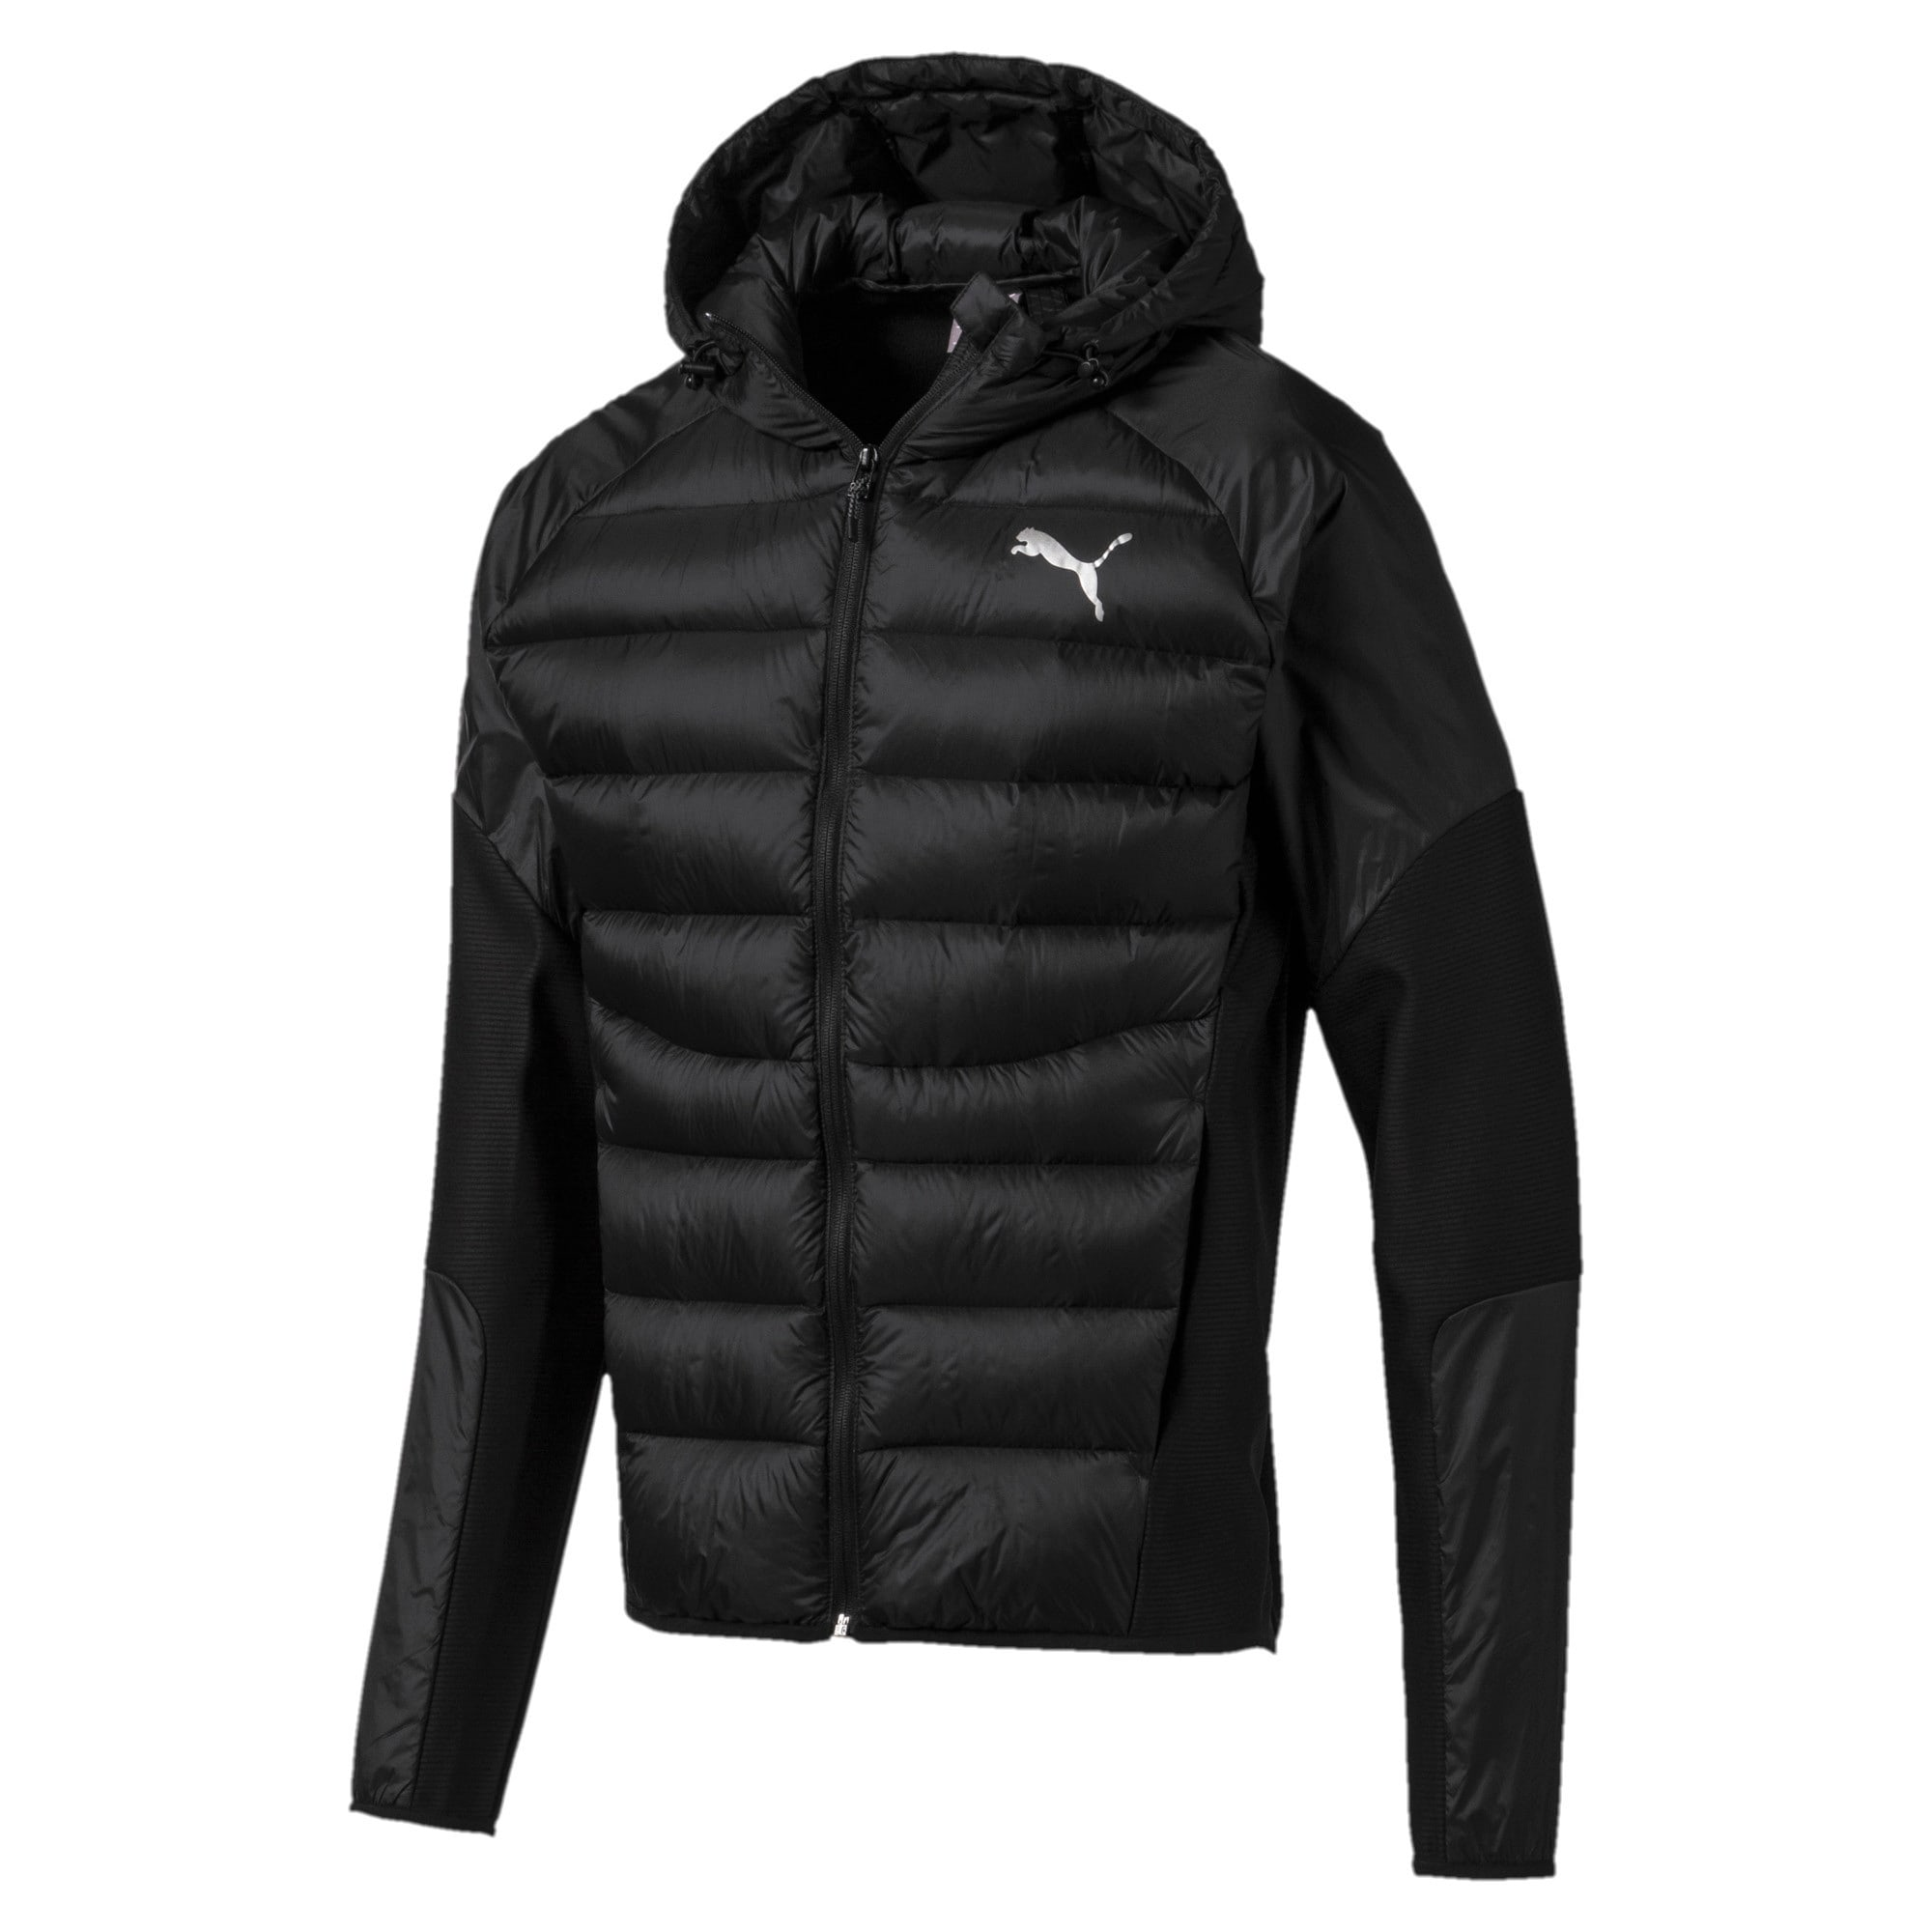 Thumbnail 4 of 600 Hybrid Down Men's Jacket, Puma Black, medium-IND